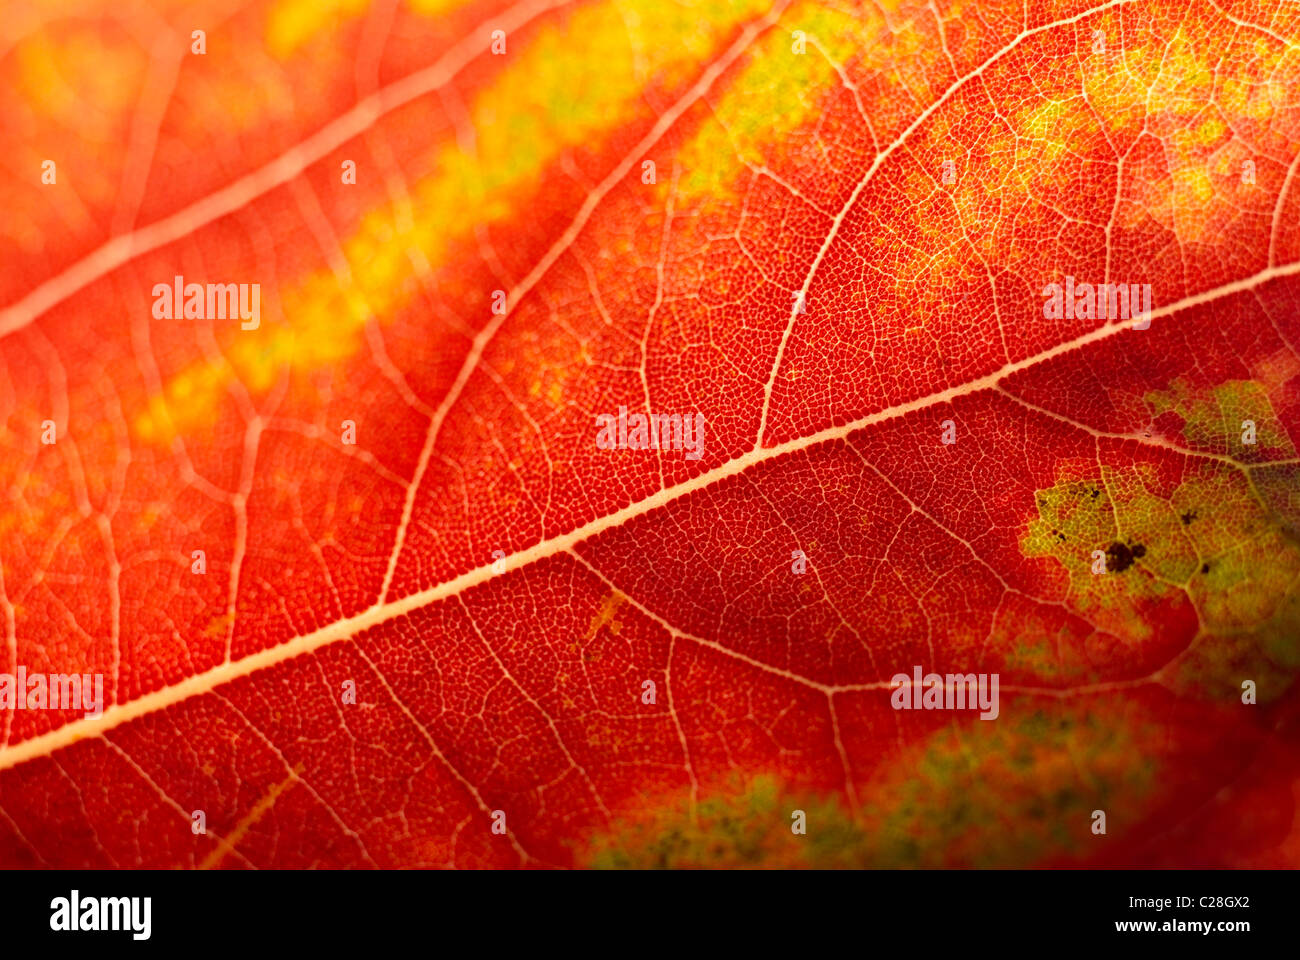 Hoja de Otoño, hojas de venas, Naranja hoja Imagen De Stock